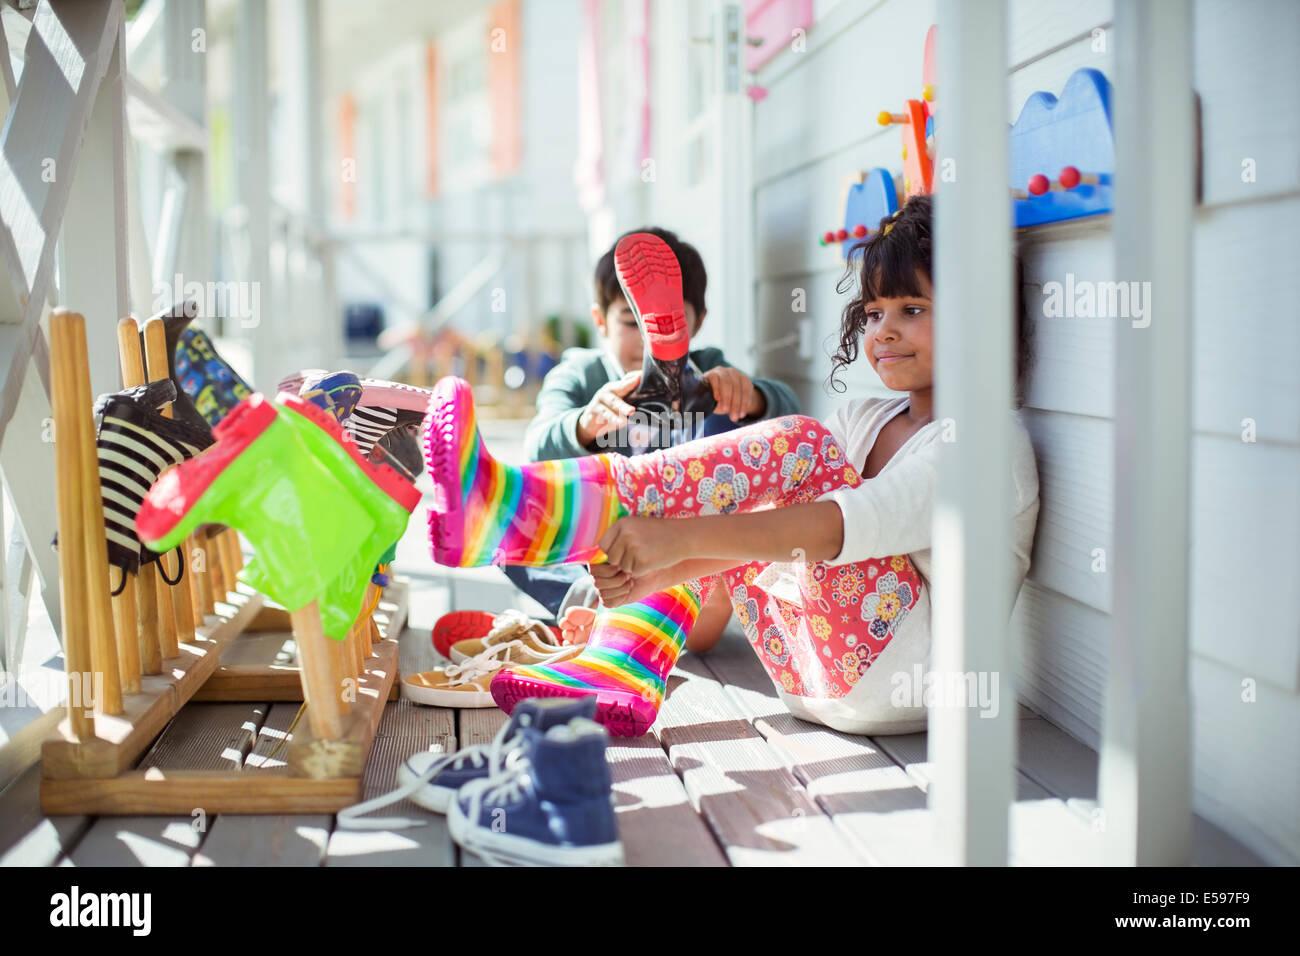 Children pulling on rainboots on porch - Stock Image